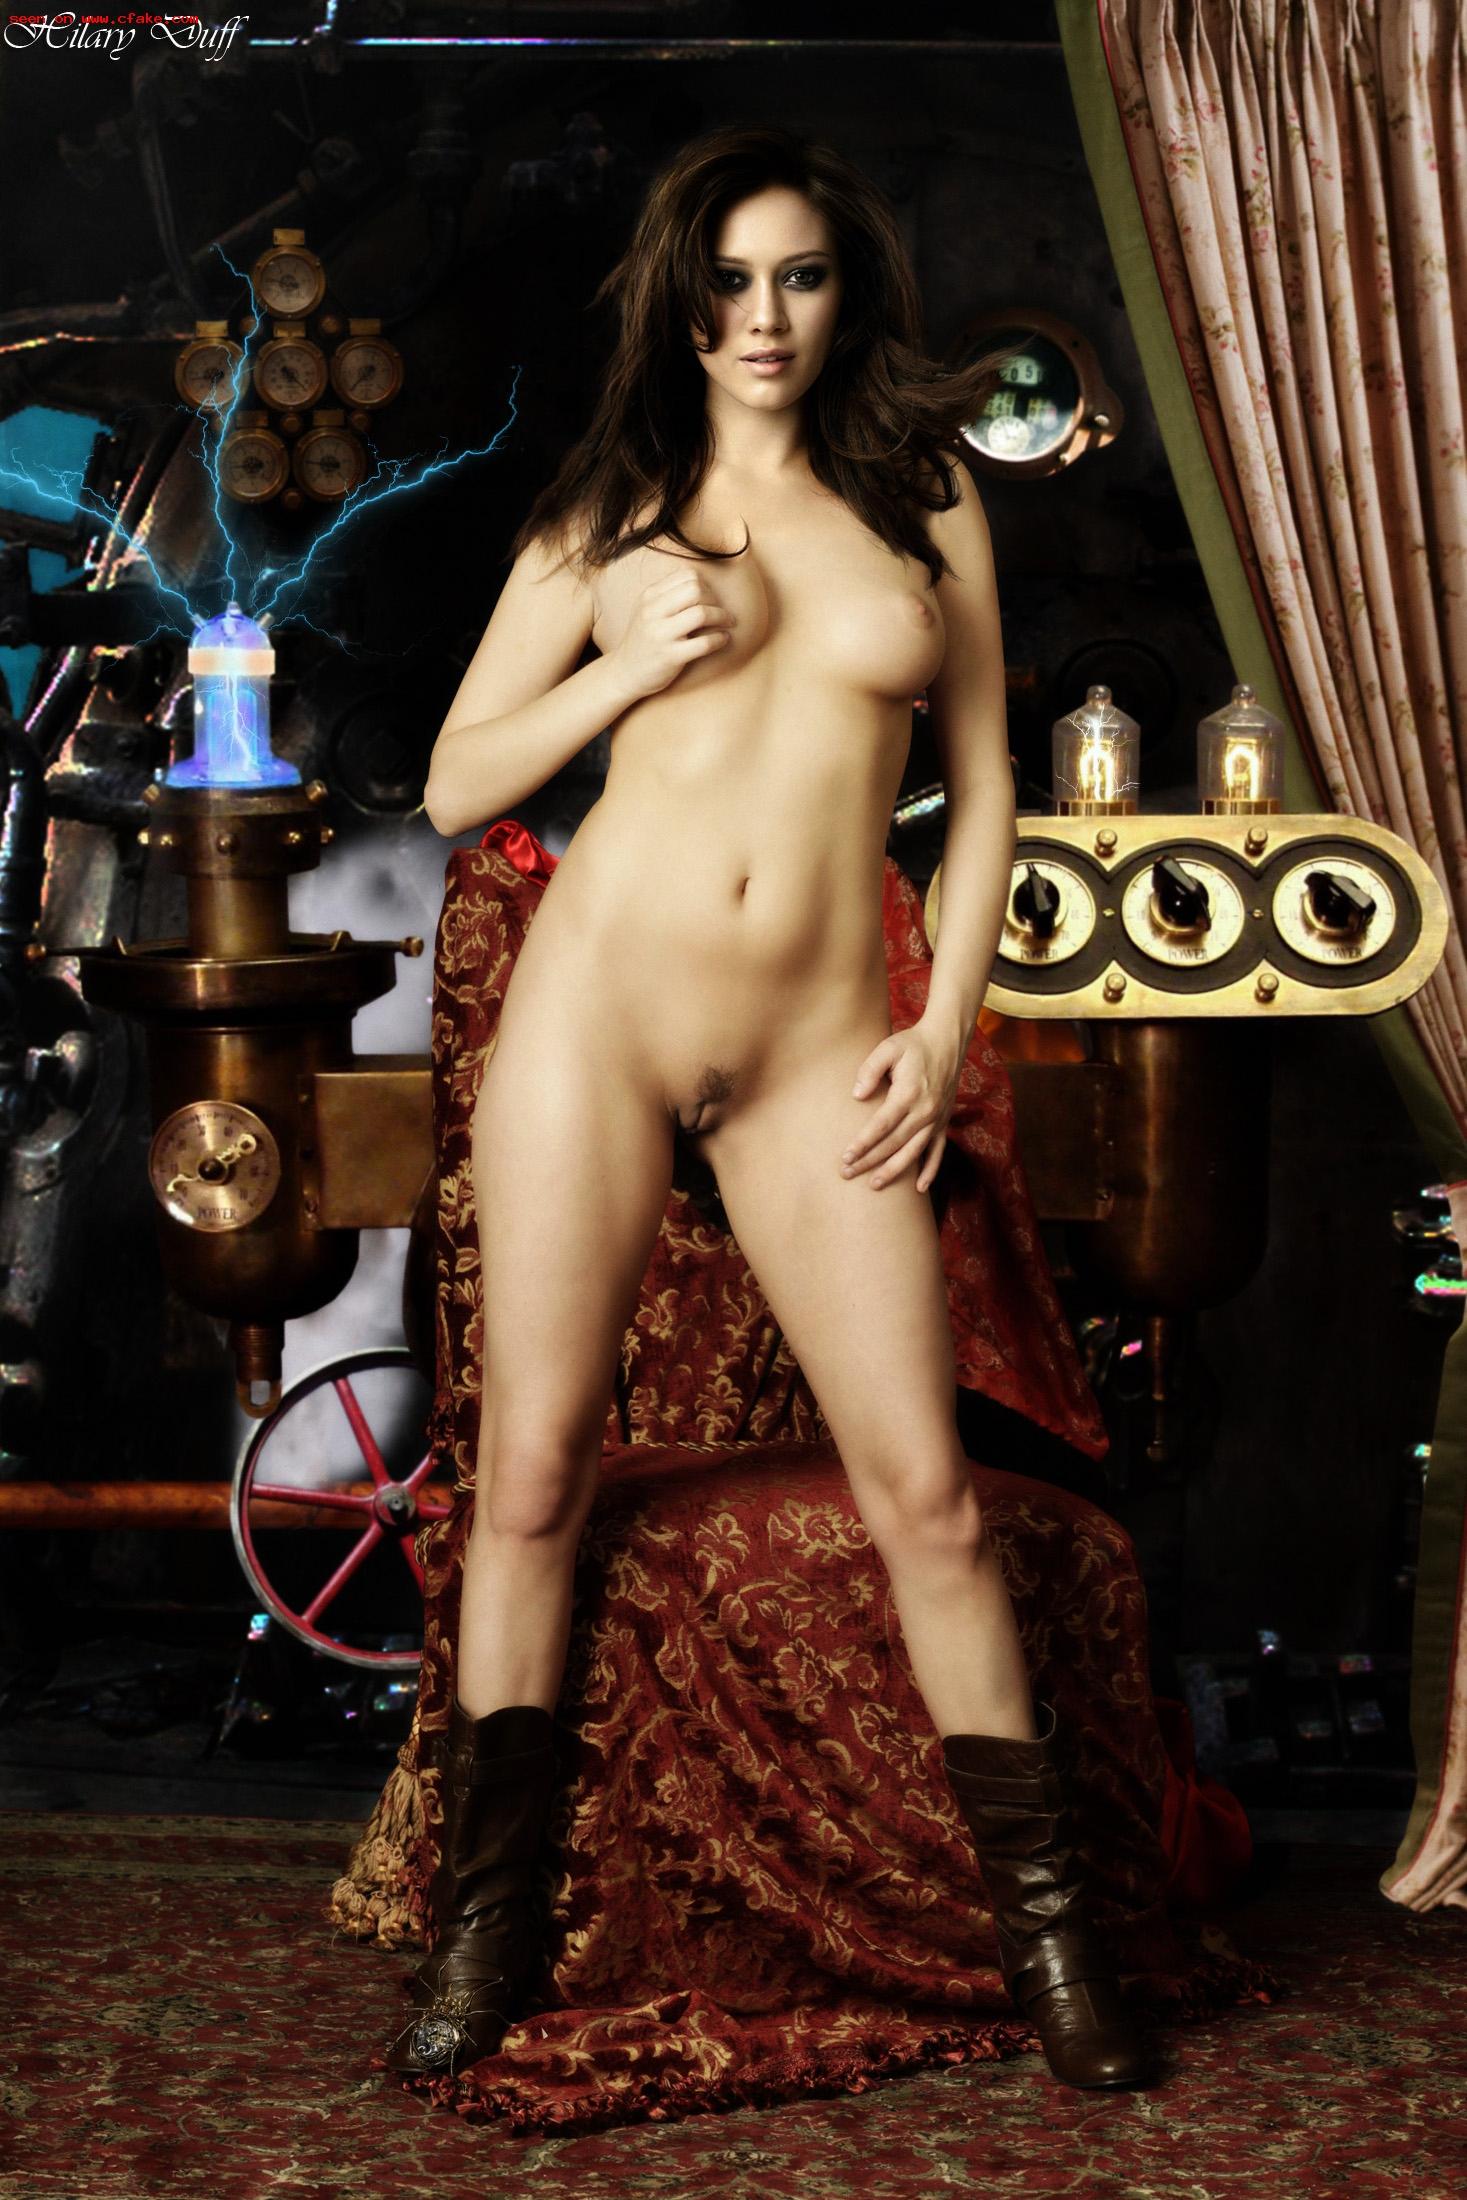 Robb Nude Pictures Annasophia#8